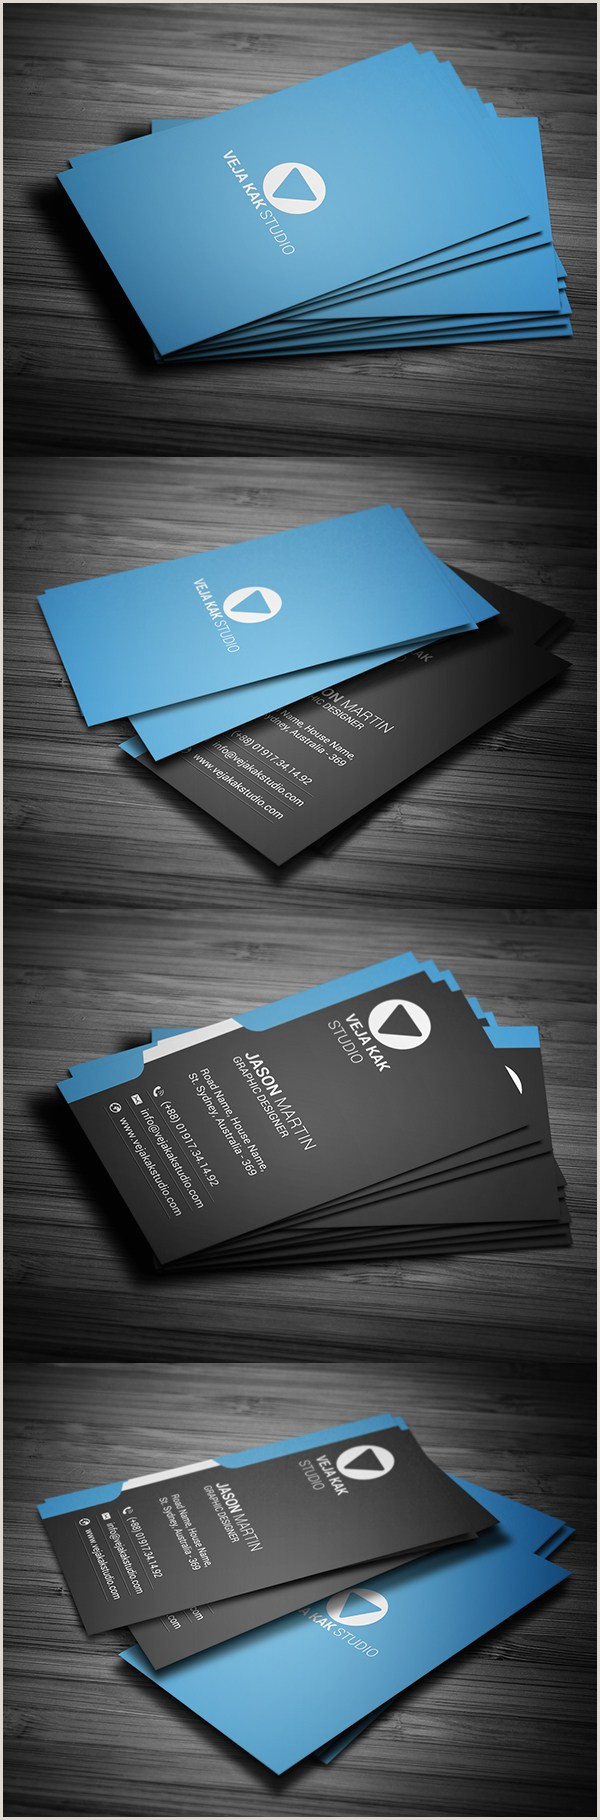 Unique Business Cards Design Modern Vertical Business Card